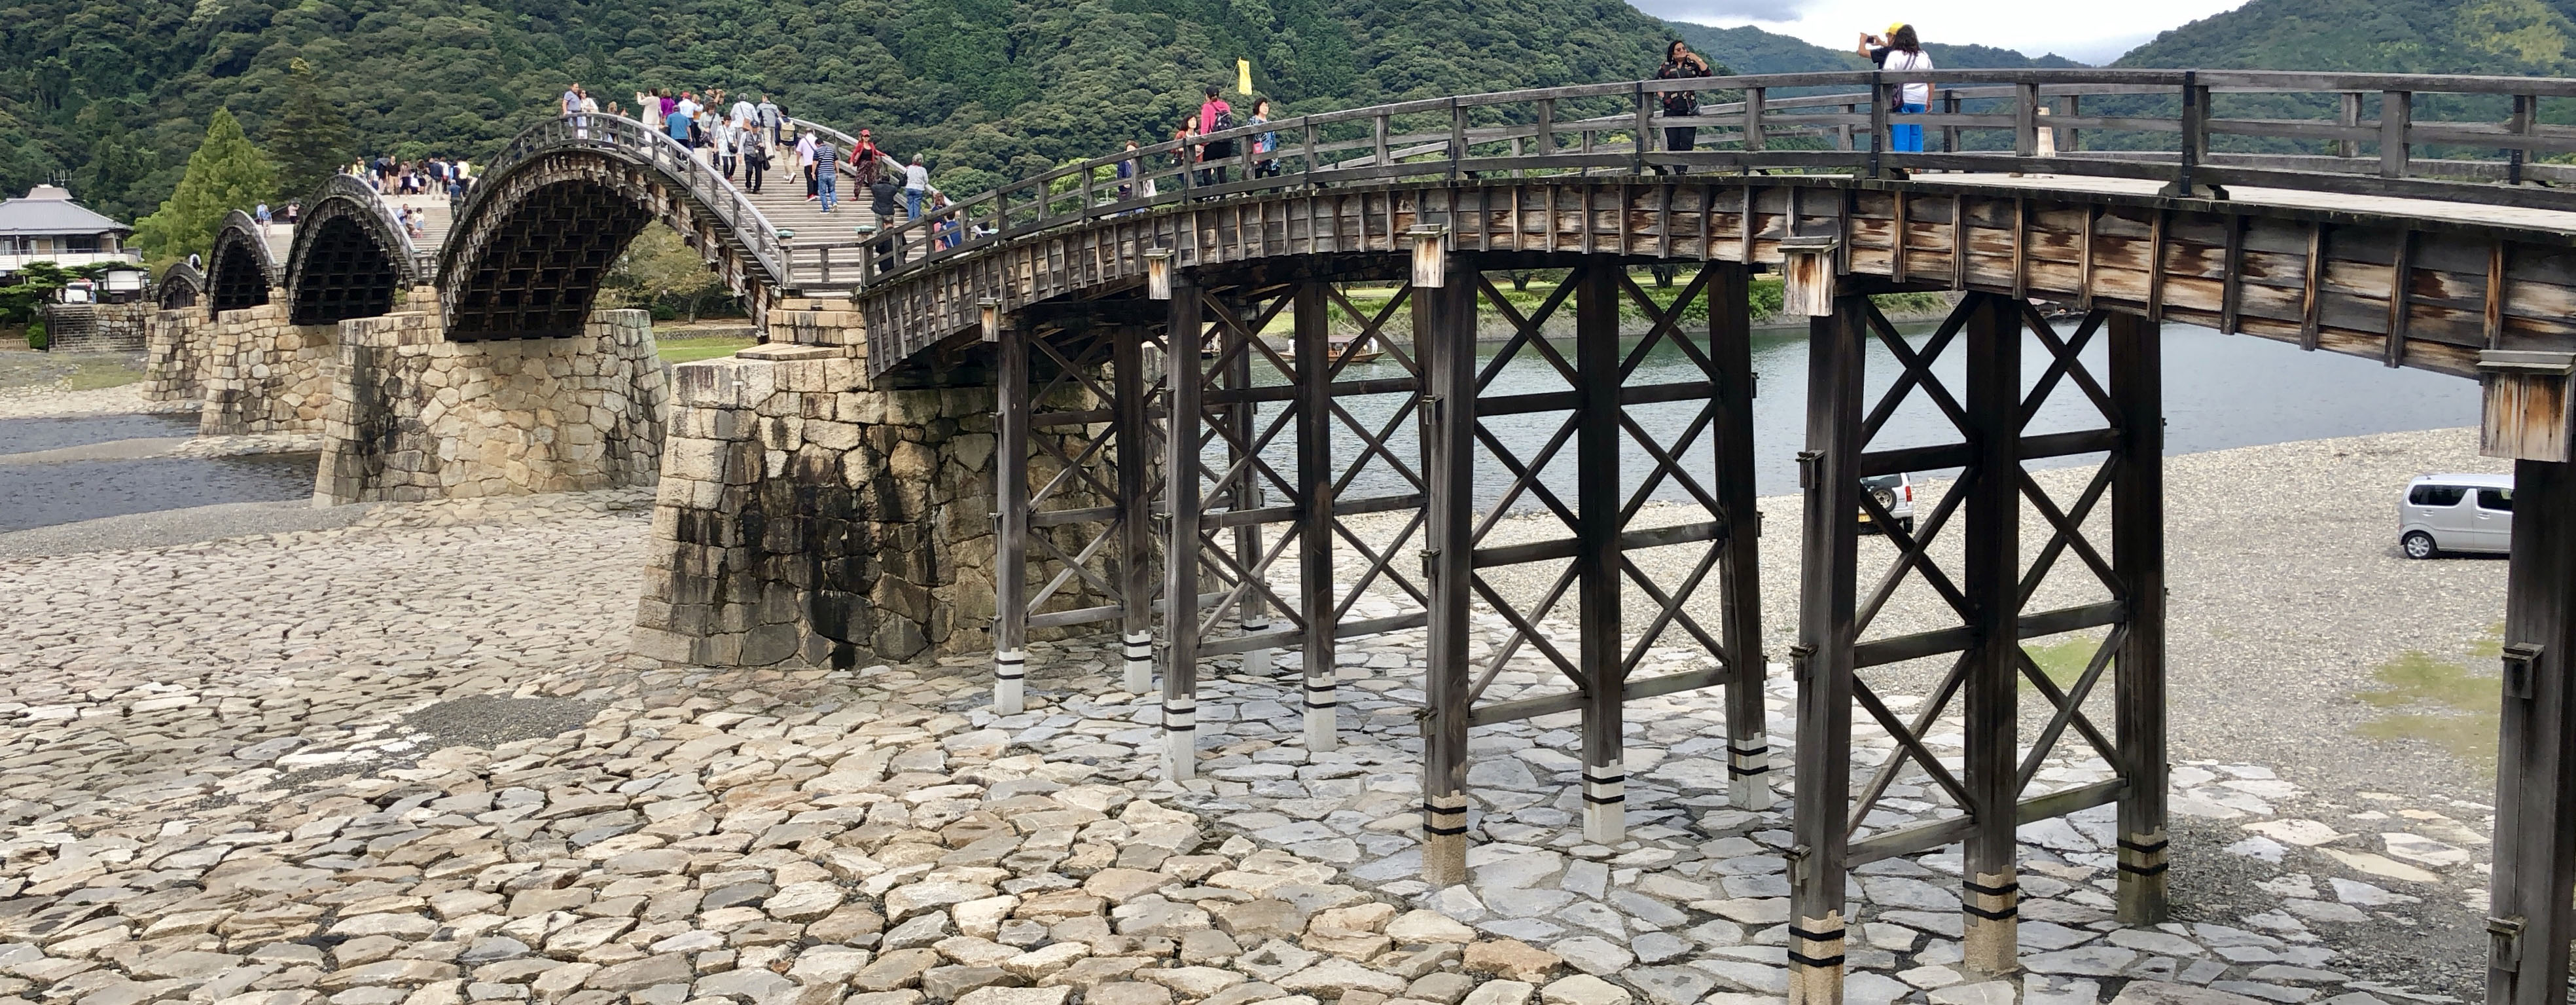 Kintaikyo: tifones y samuráis. 錦帯橋